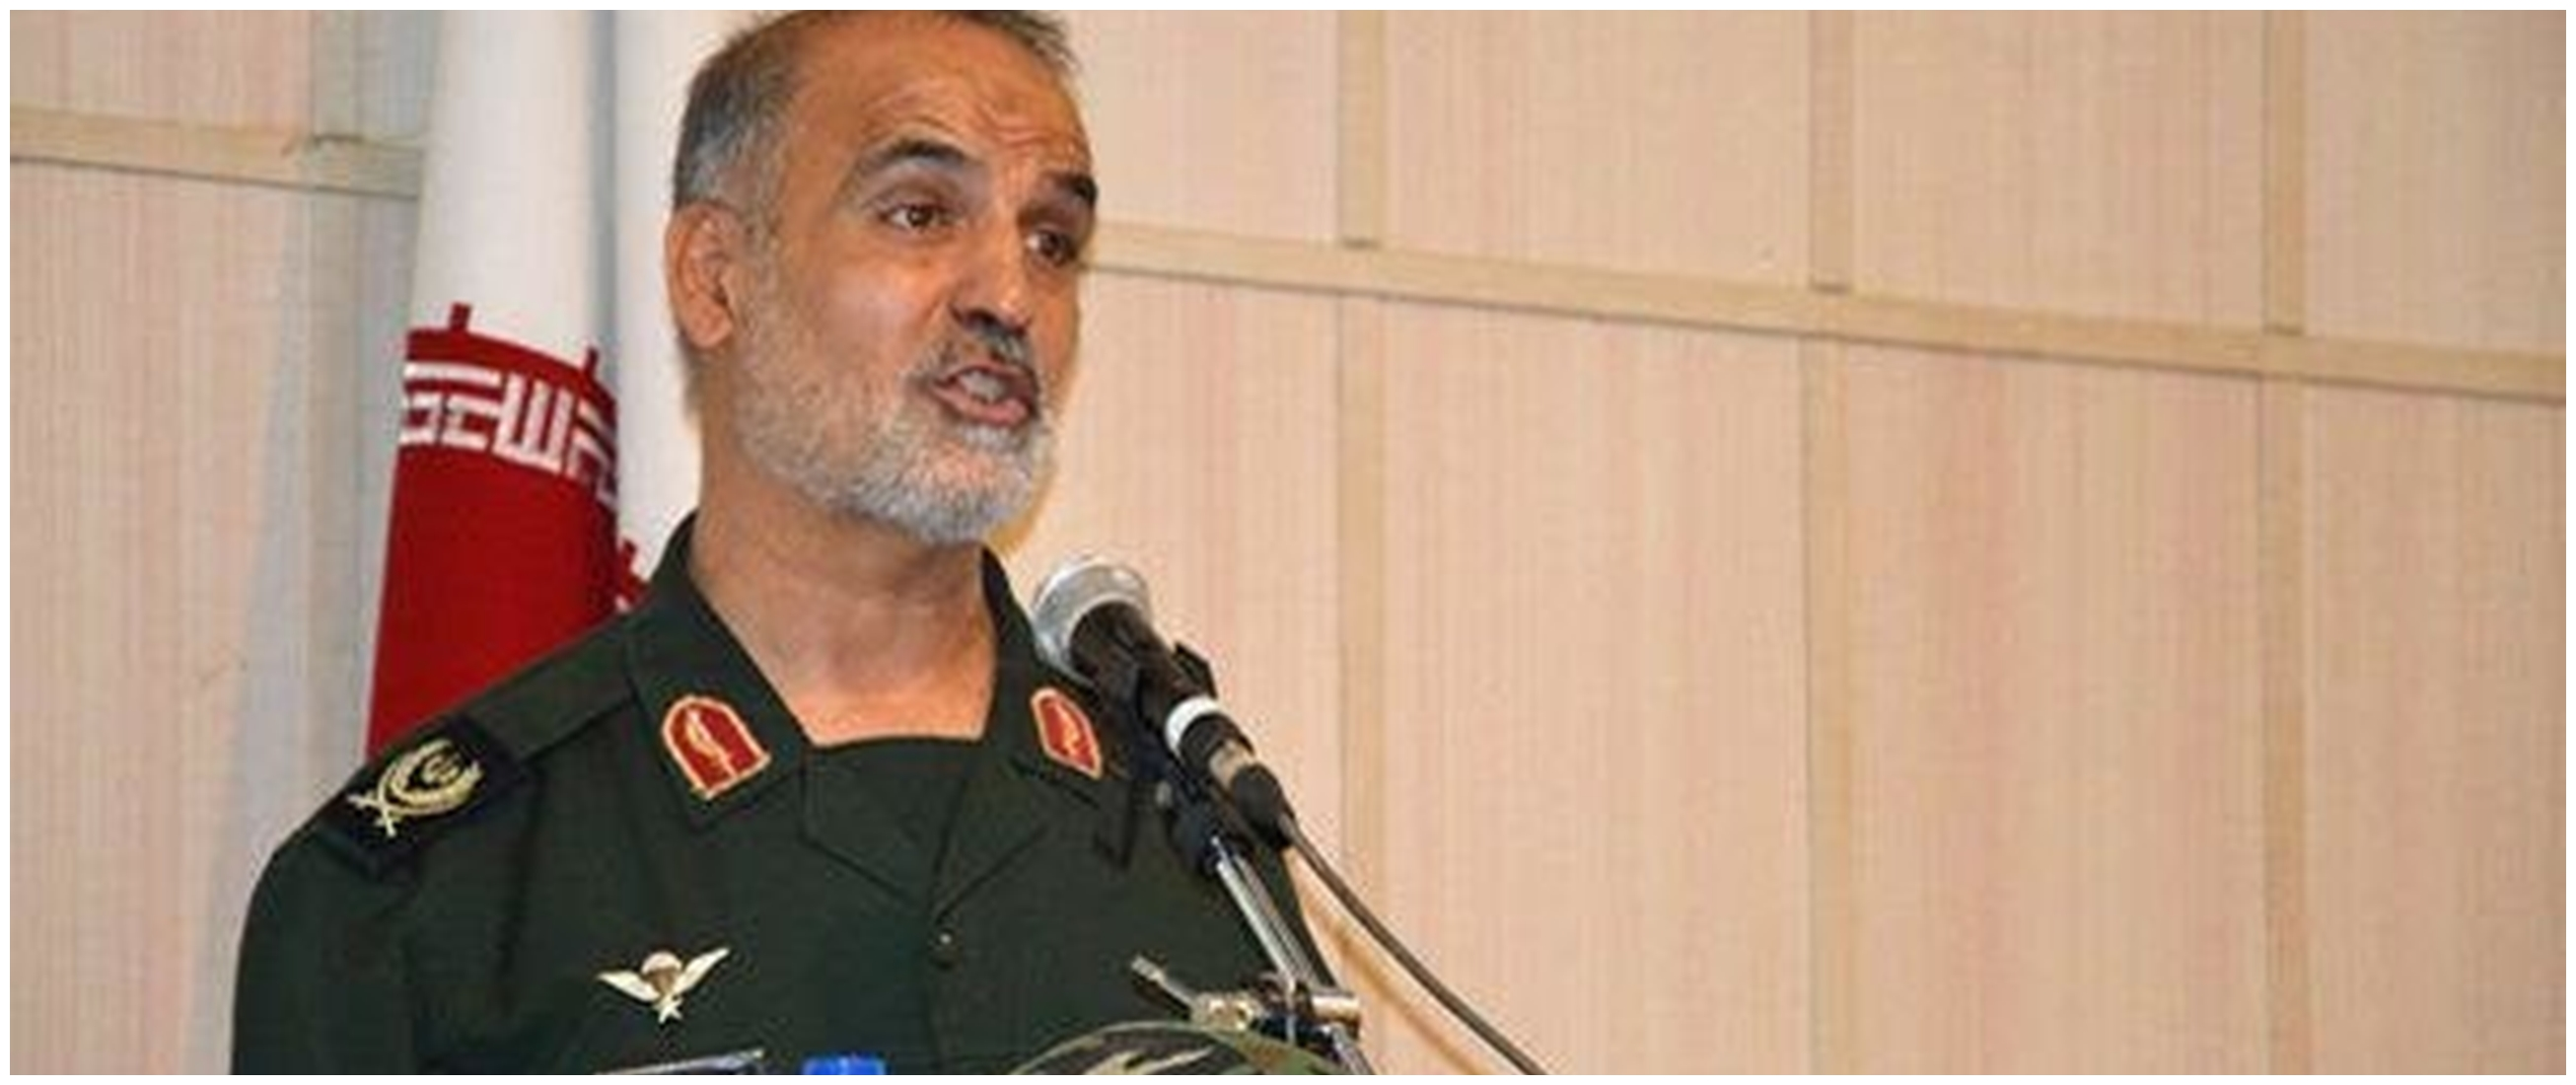 Komandan Iran Nasser Shabani meninggal dunia karena virus Corona